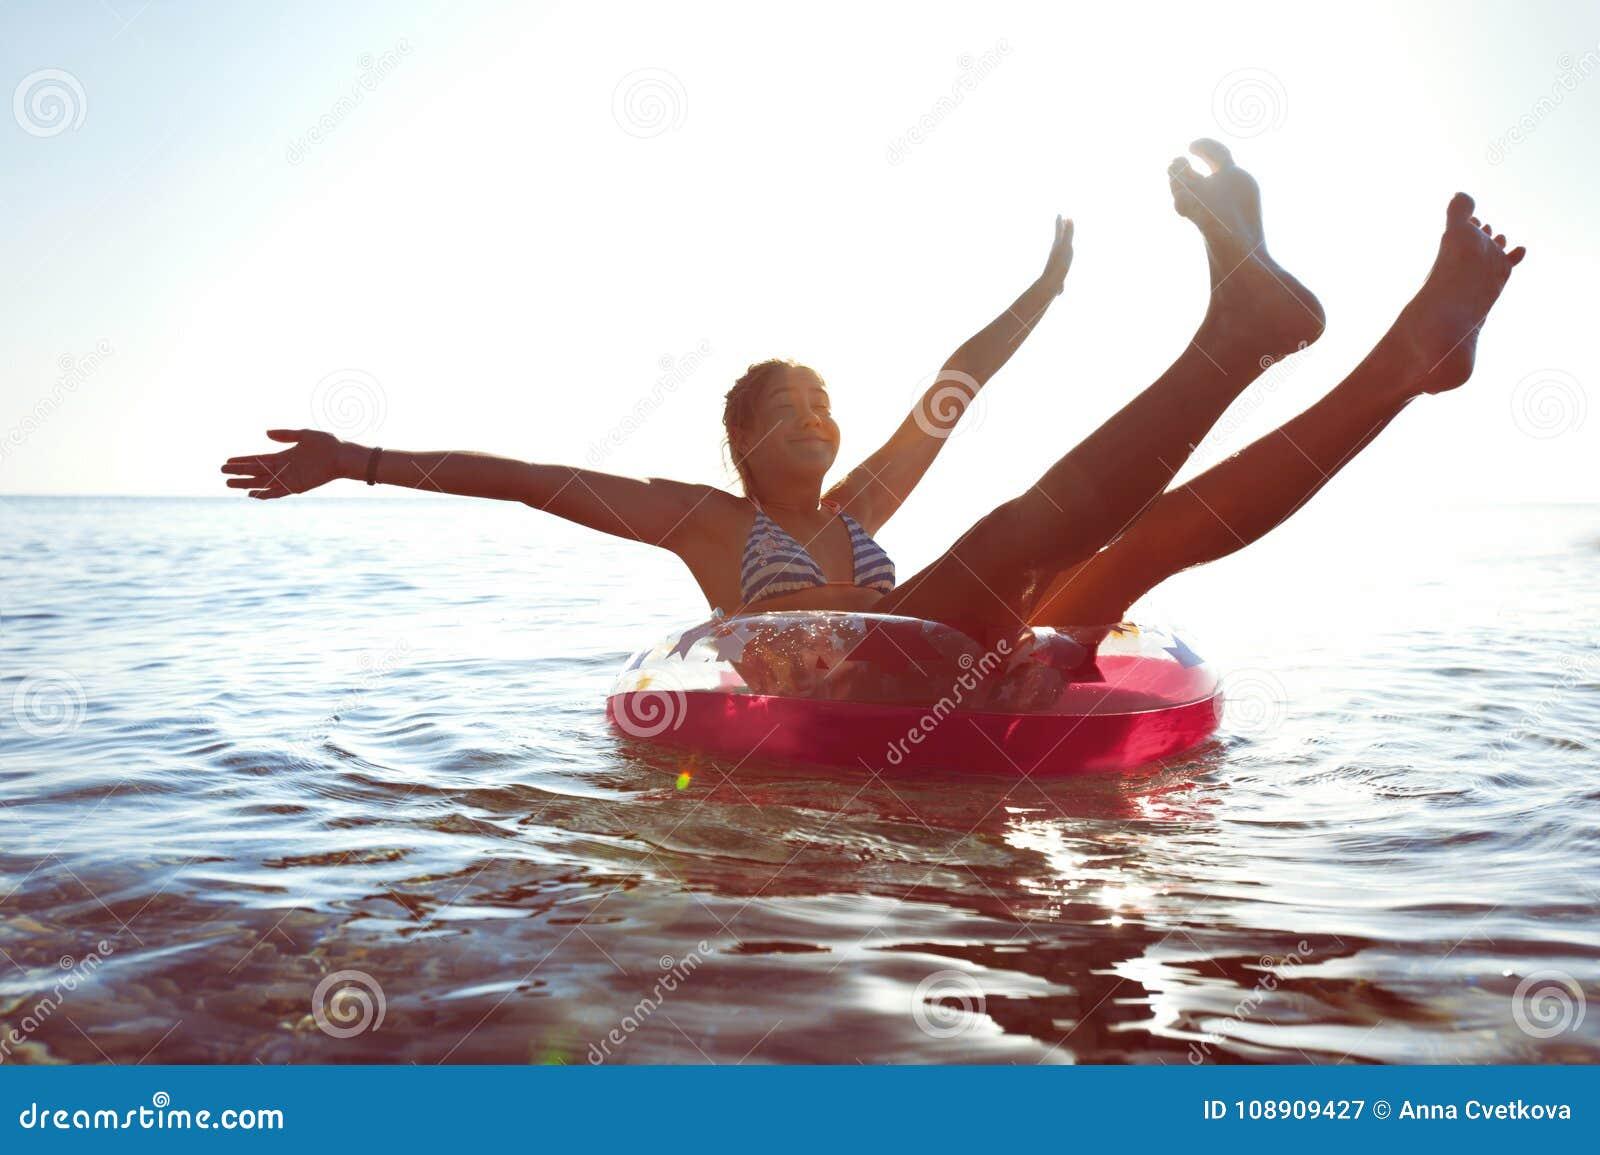 Teens outdoors having enjoyment